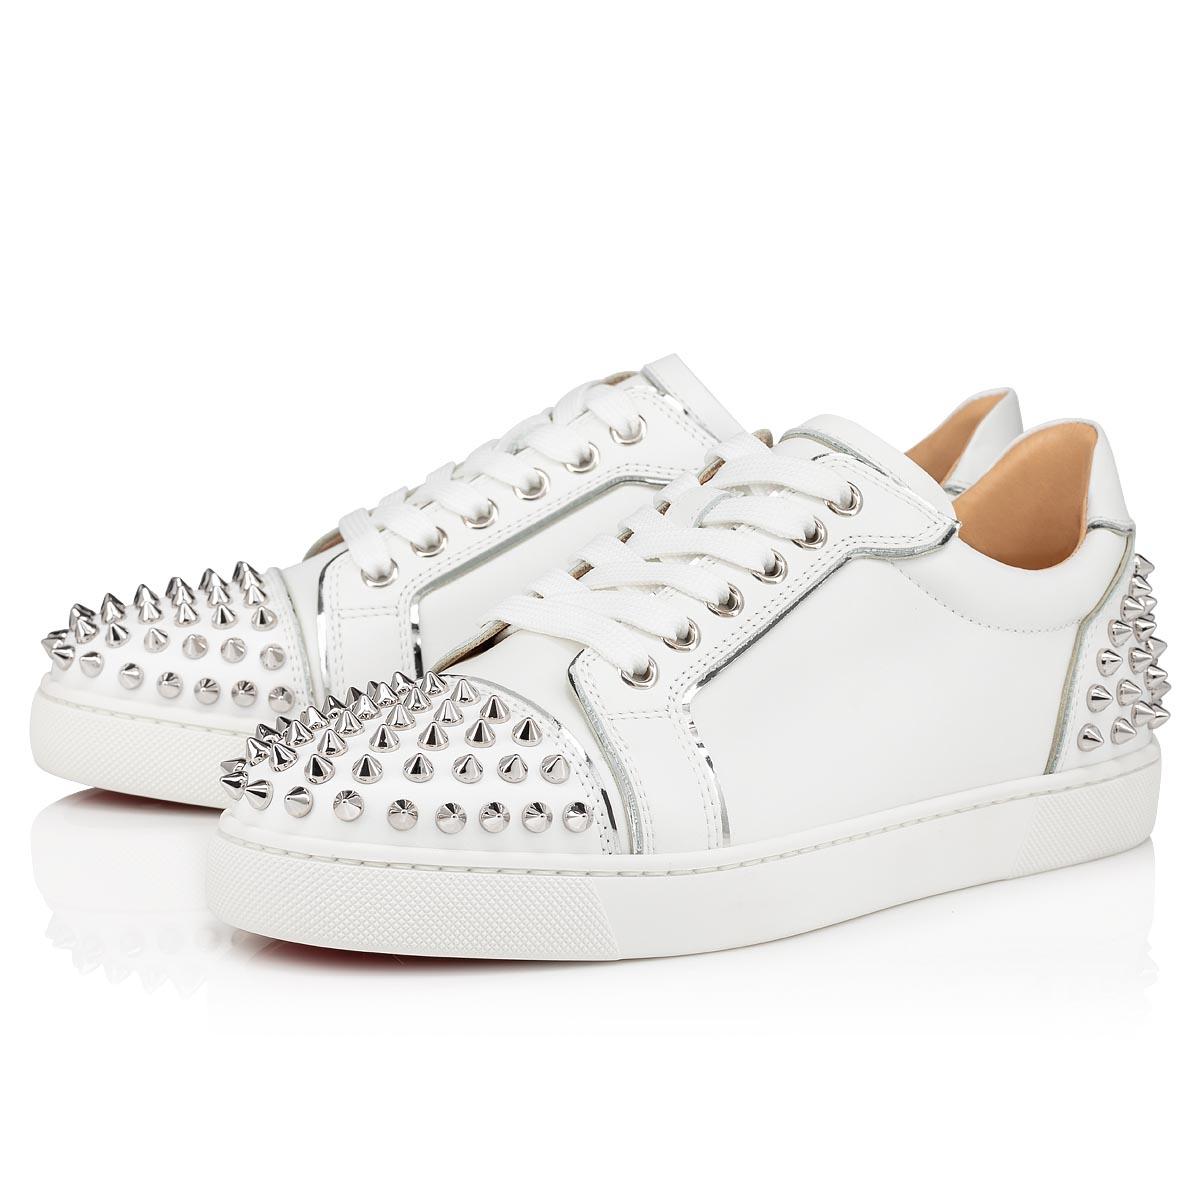 Vieira 2 BIANCO/SILVER CALF - Shoes